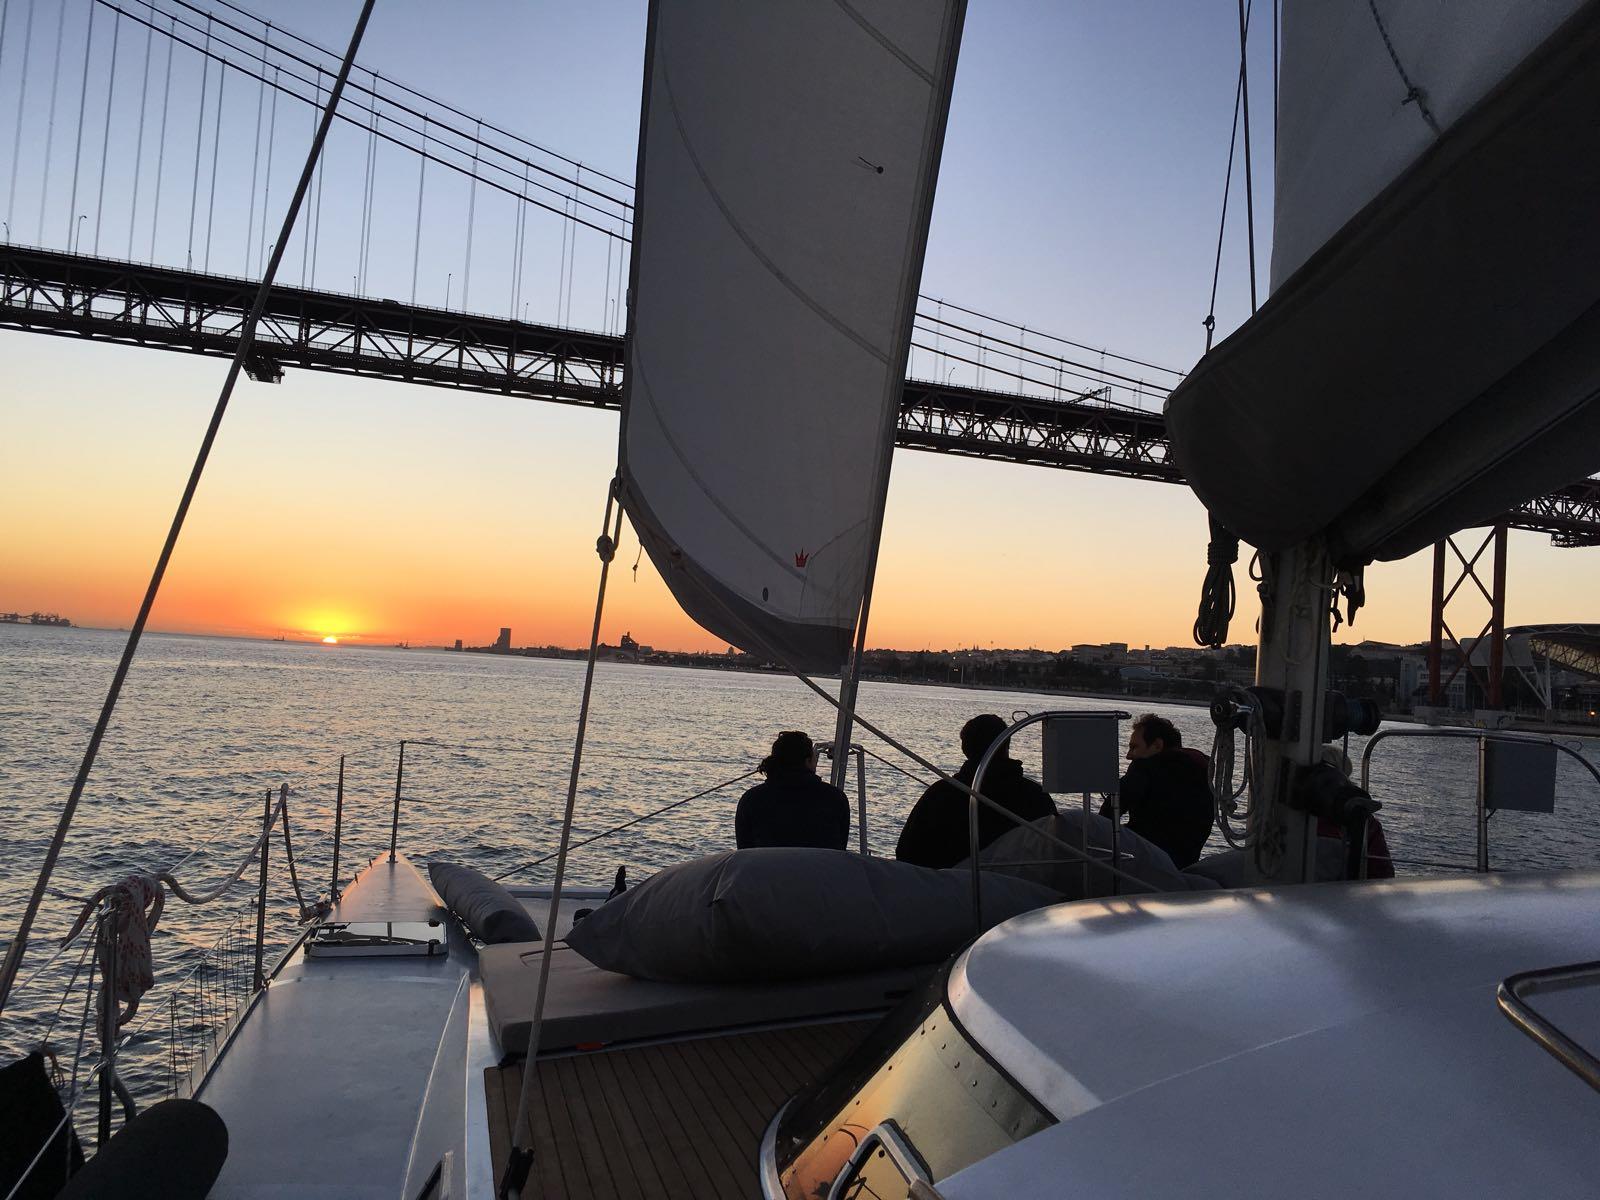 Fiesta en barco en Lisboa. Catamarán en Lisboa. Paseo en barco por el río Tajo. Despedida de soltero en Lisboa